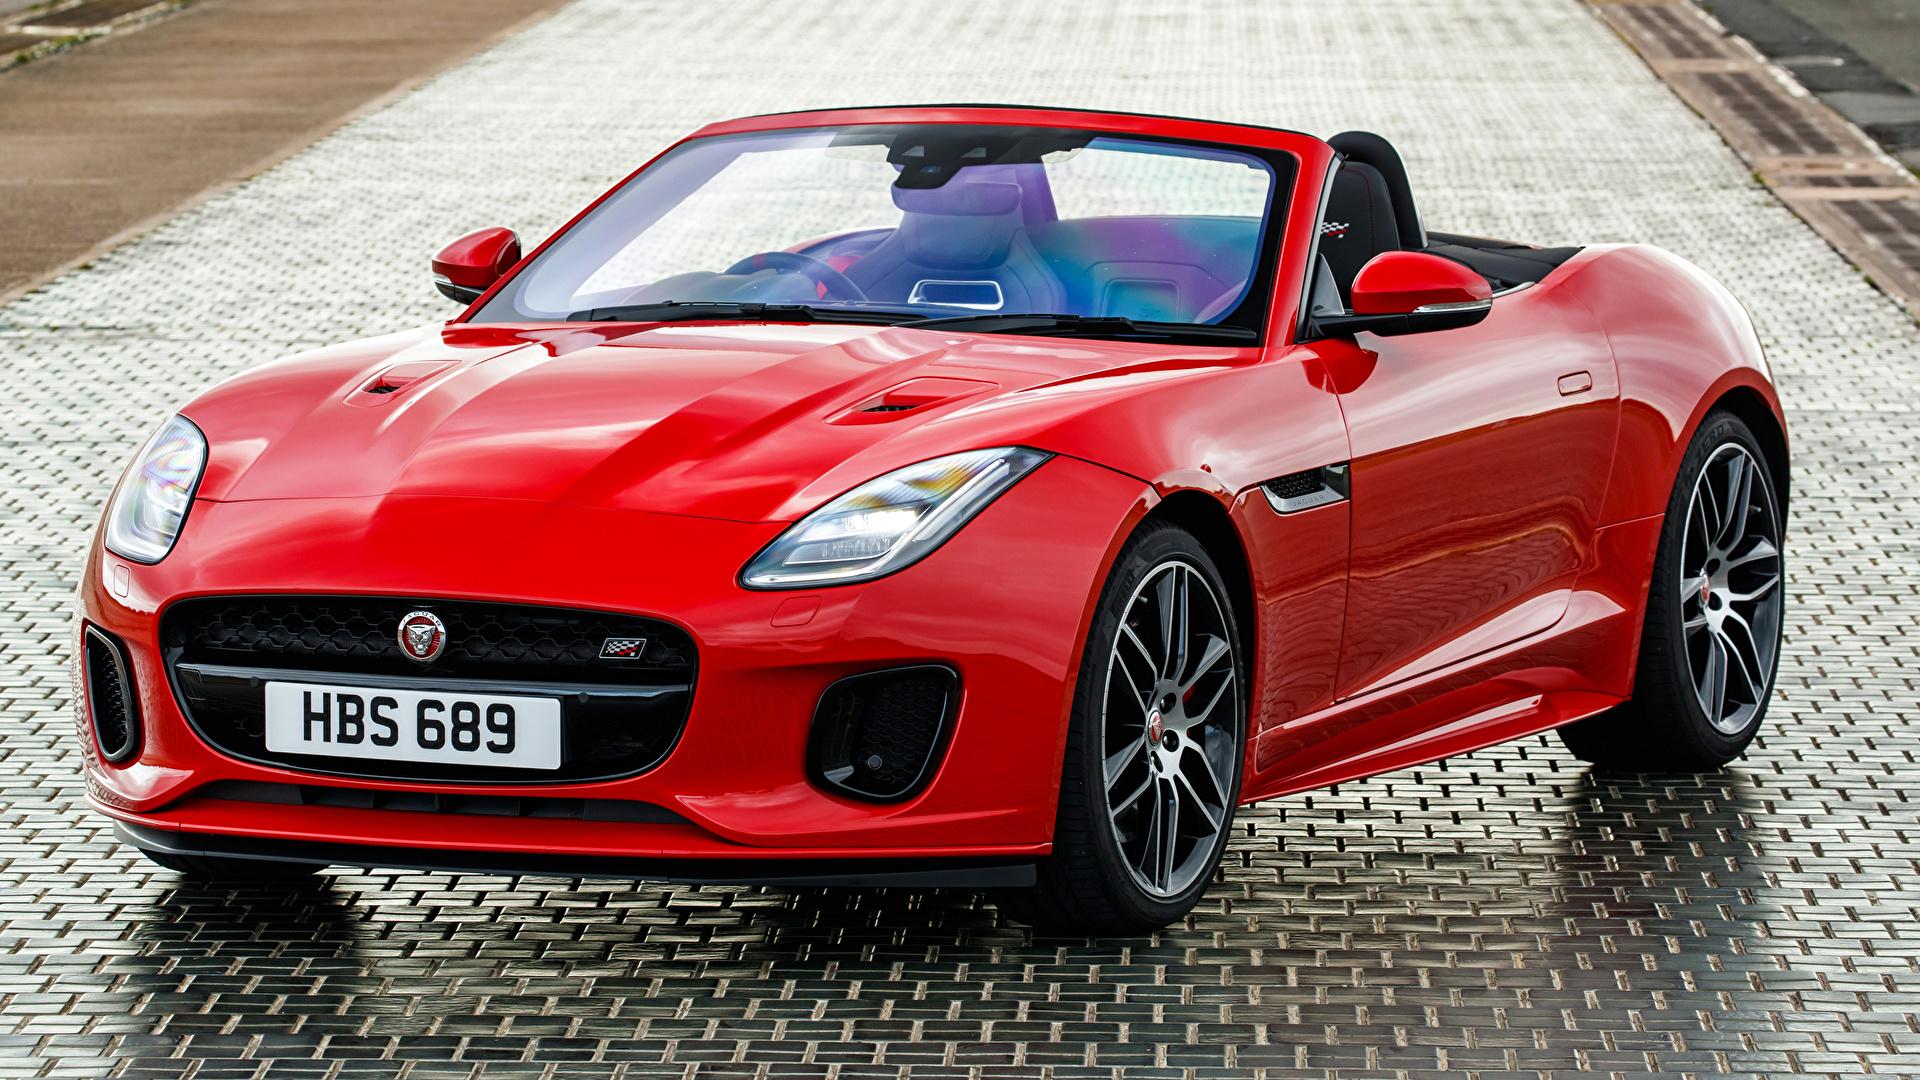 Обои Ягуар 2018-19 F-Type  Chequered Flag  Convertible Кабриолет красные Авто Металлик 1920x1080 Jaguar кабриолета красных Красный красная Машины Автомобили